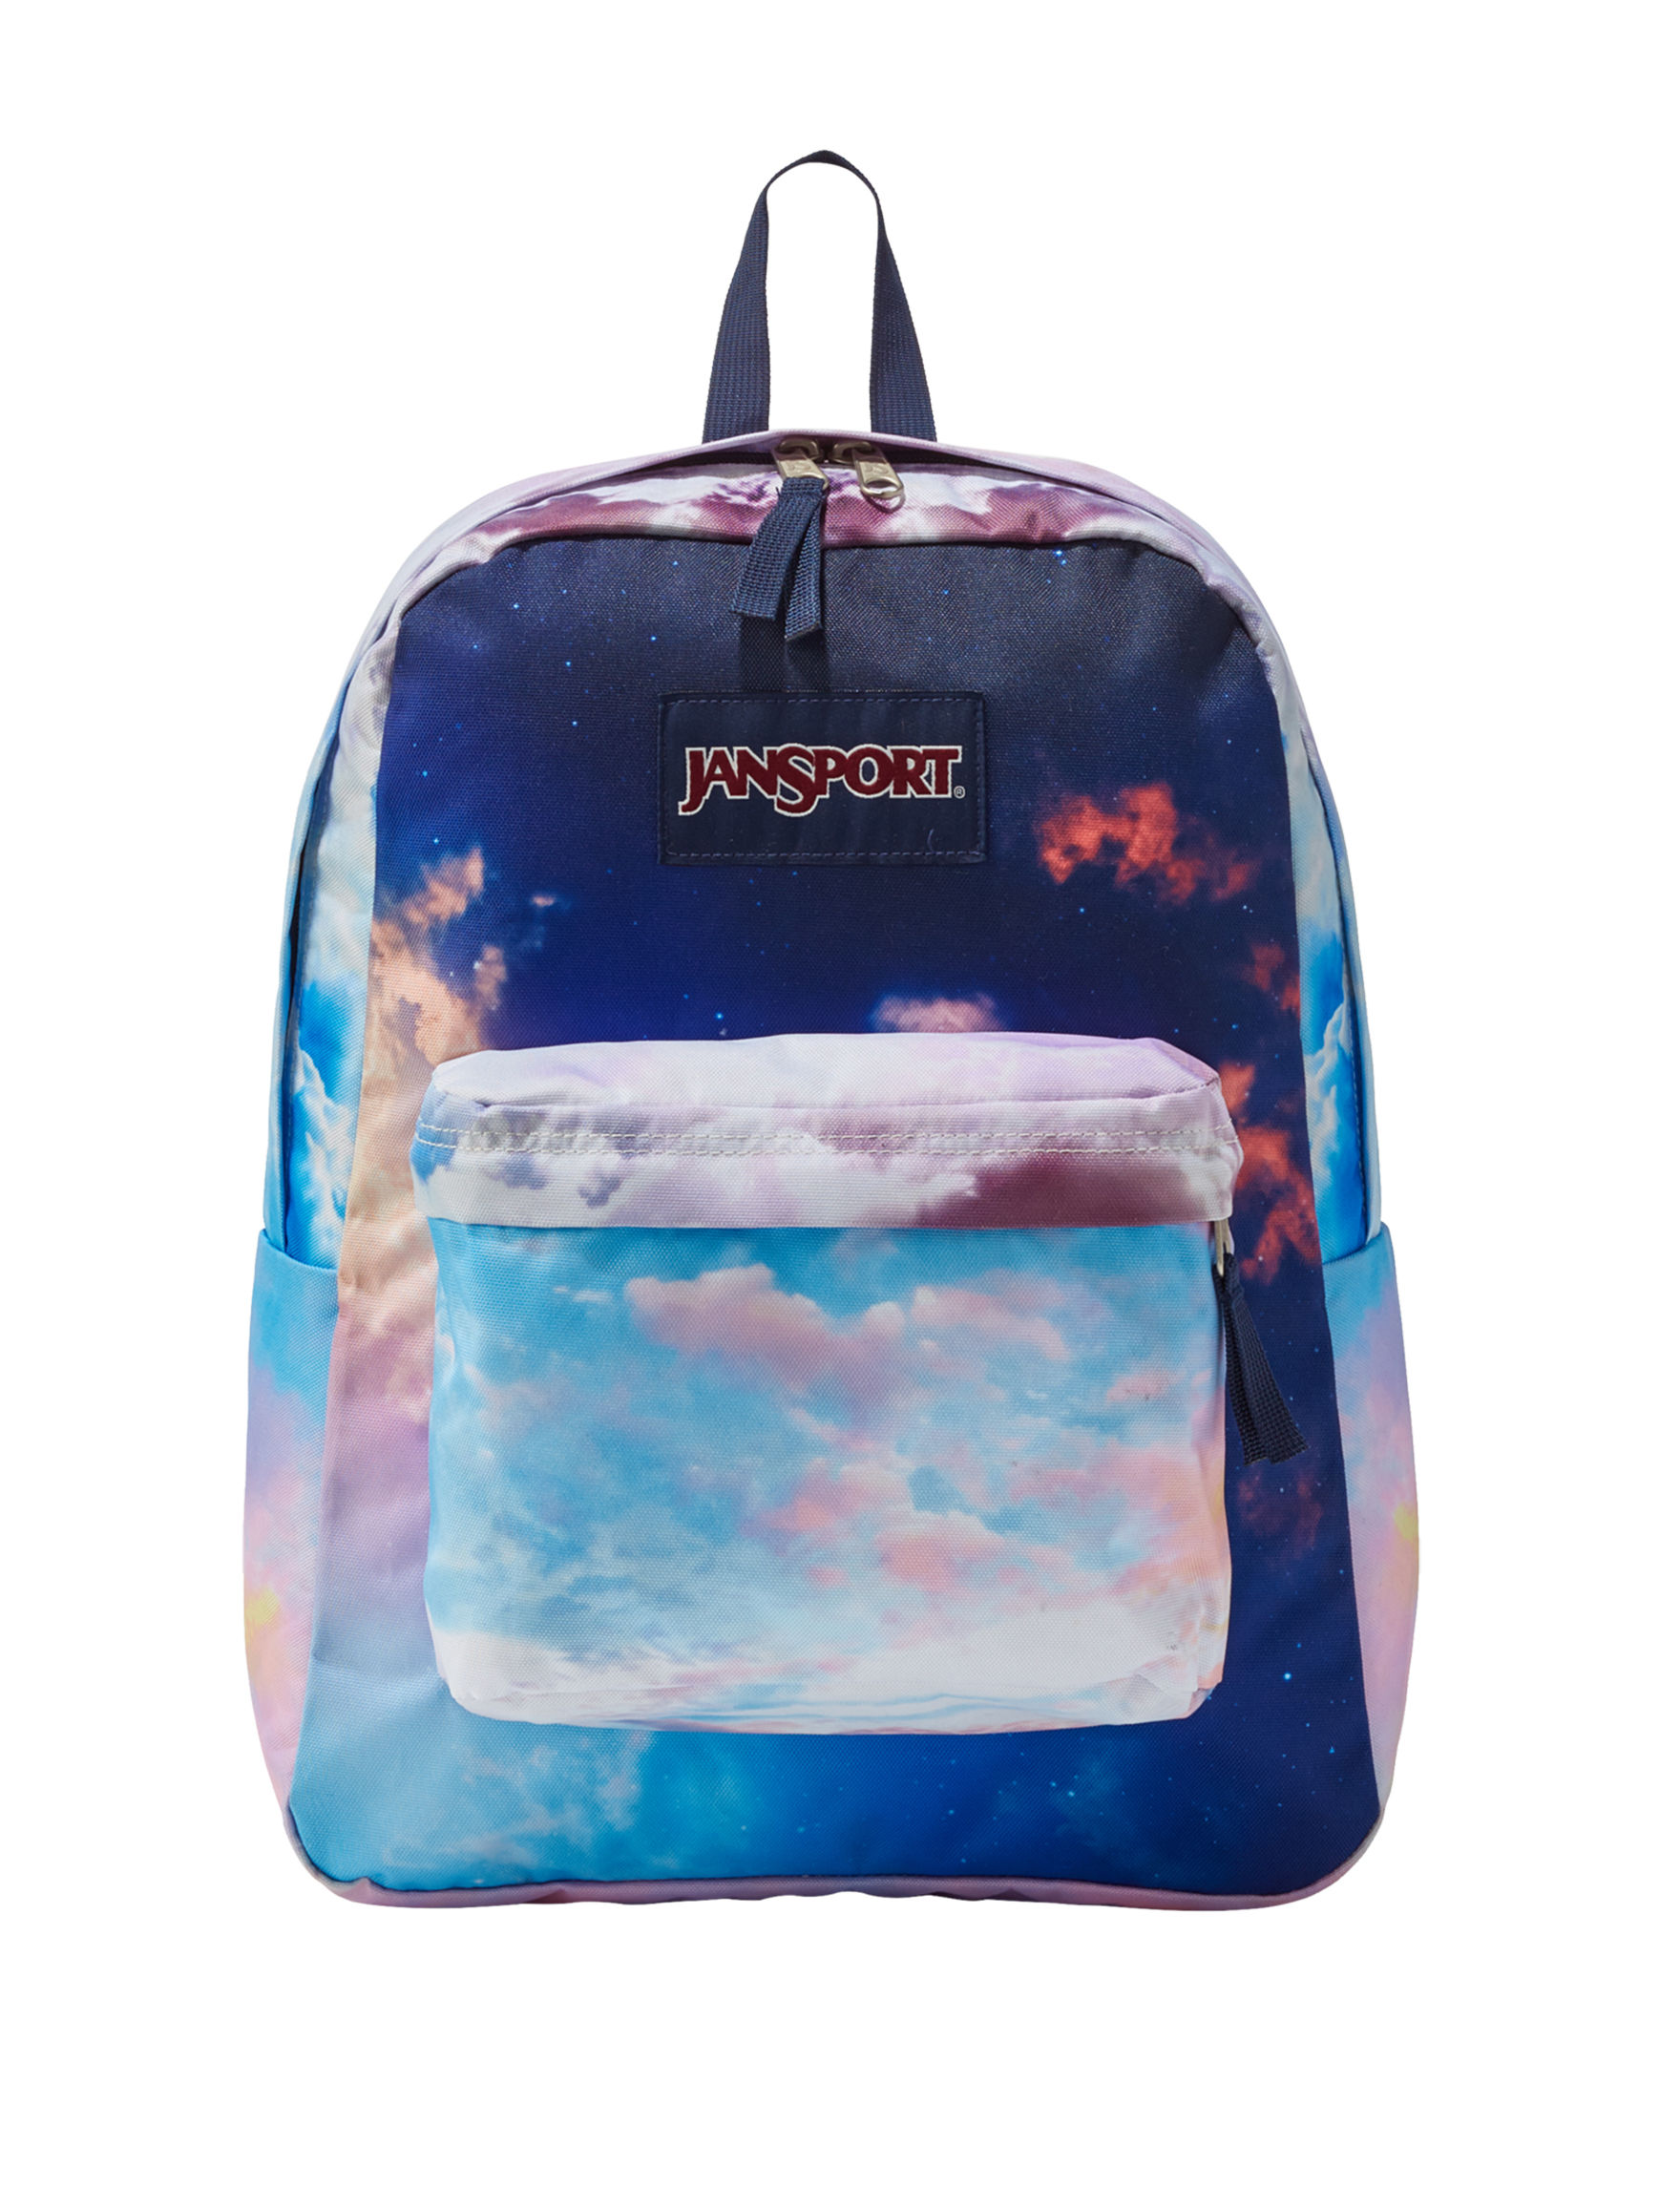 Jansport Pink Multi Bookbags & Backpacks